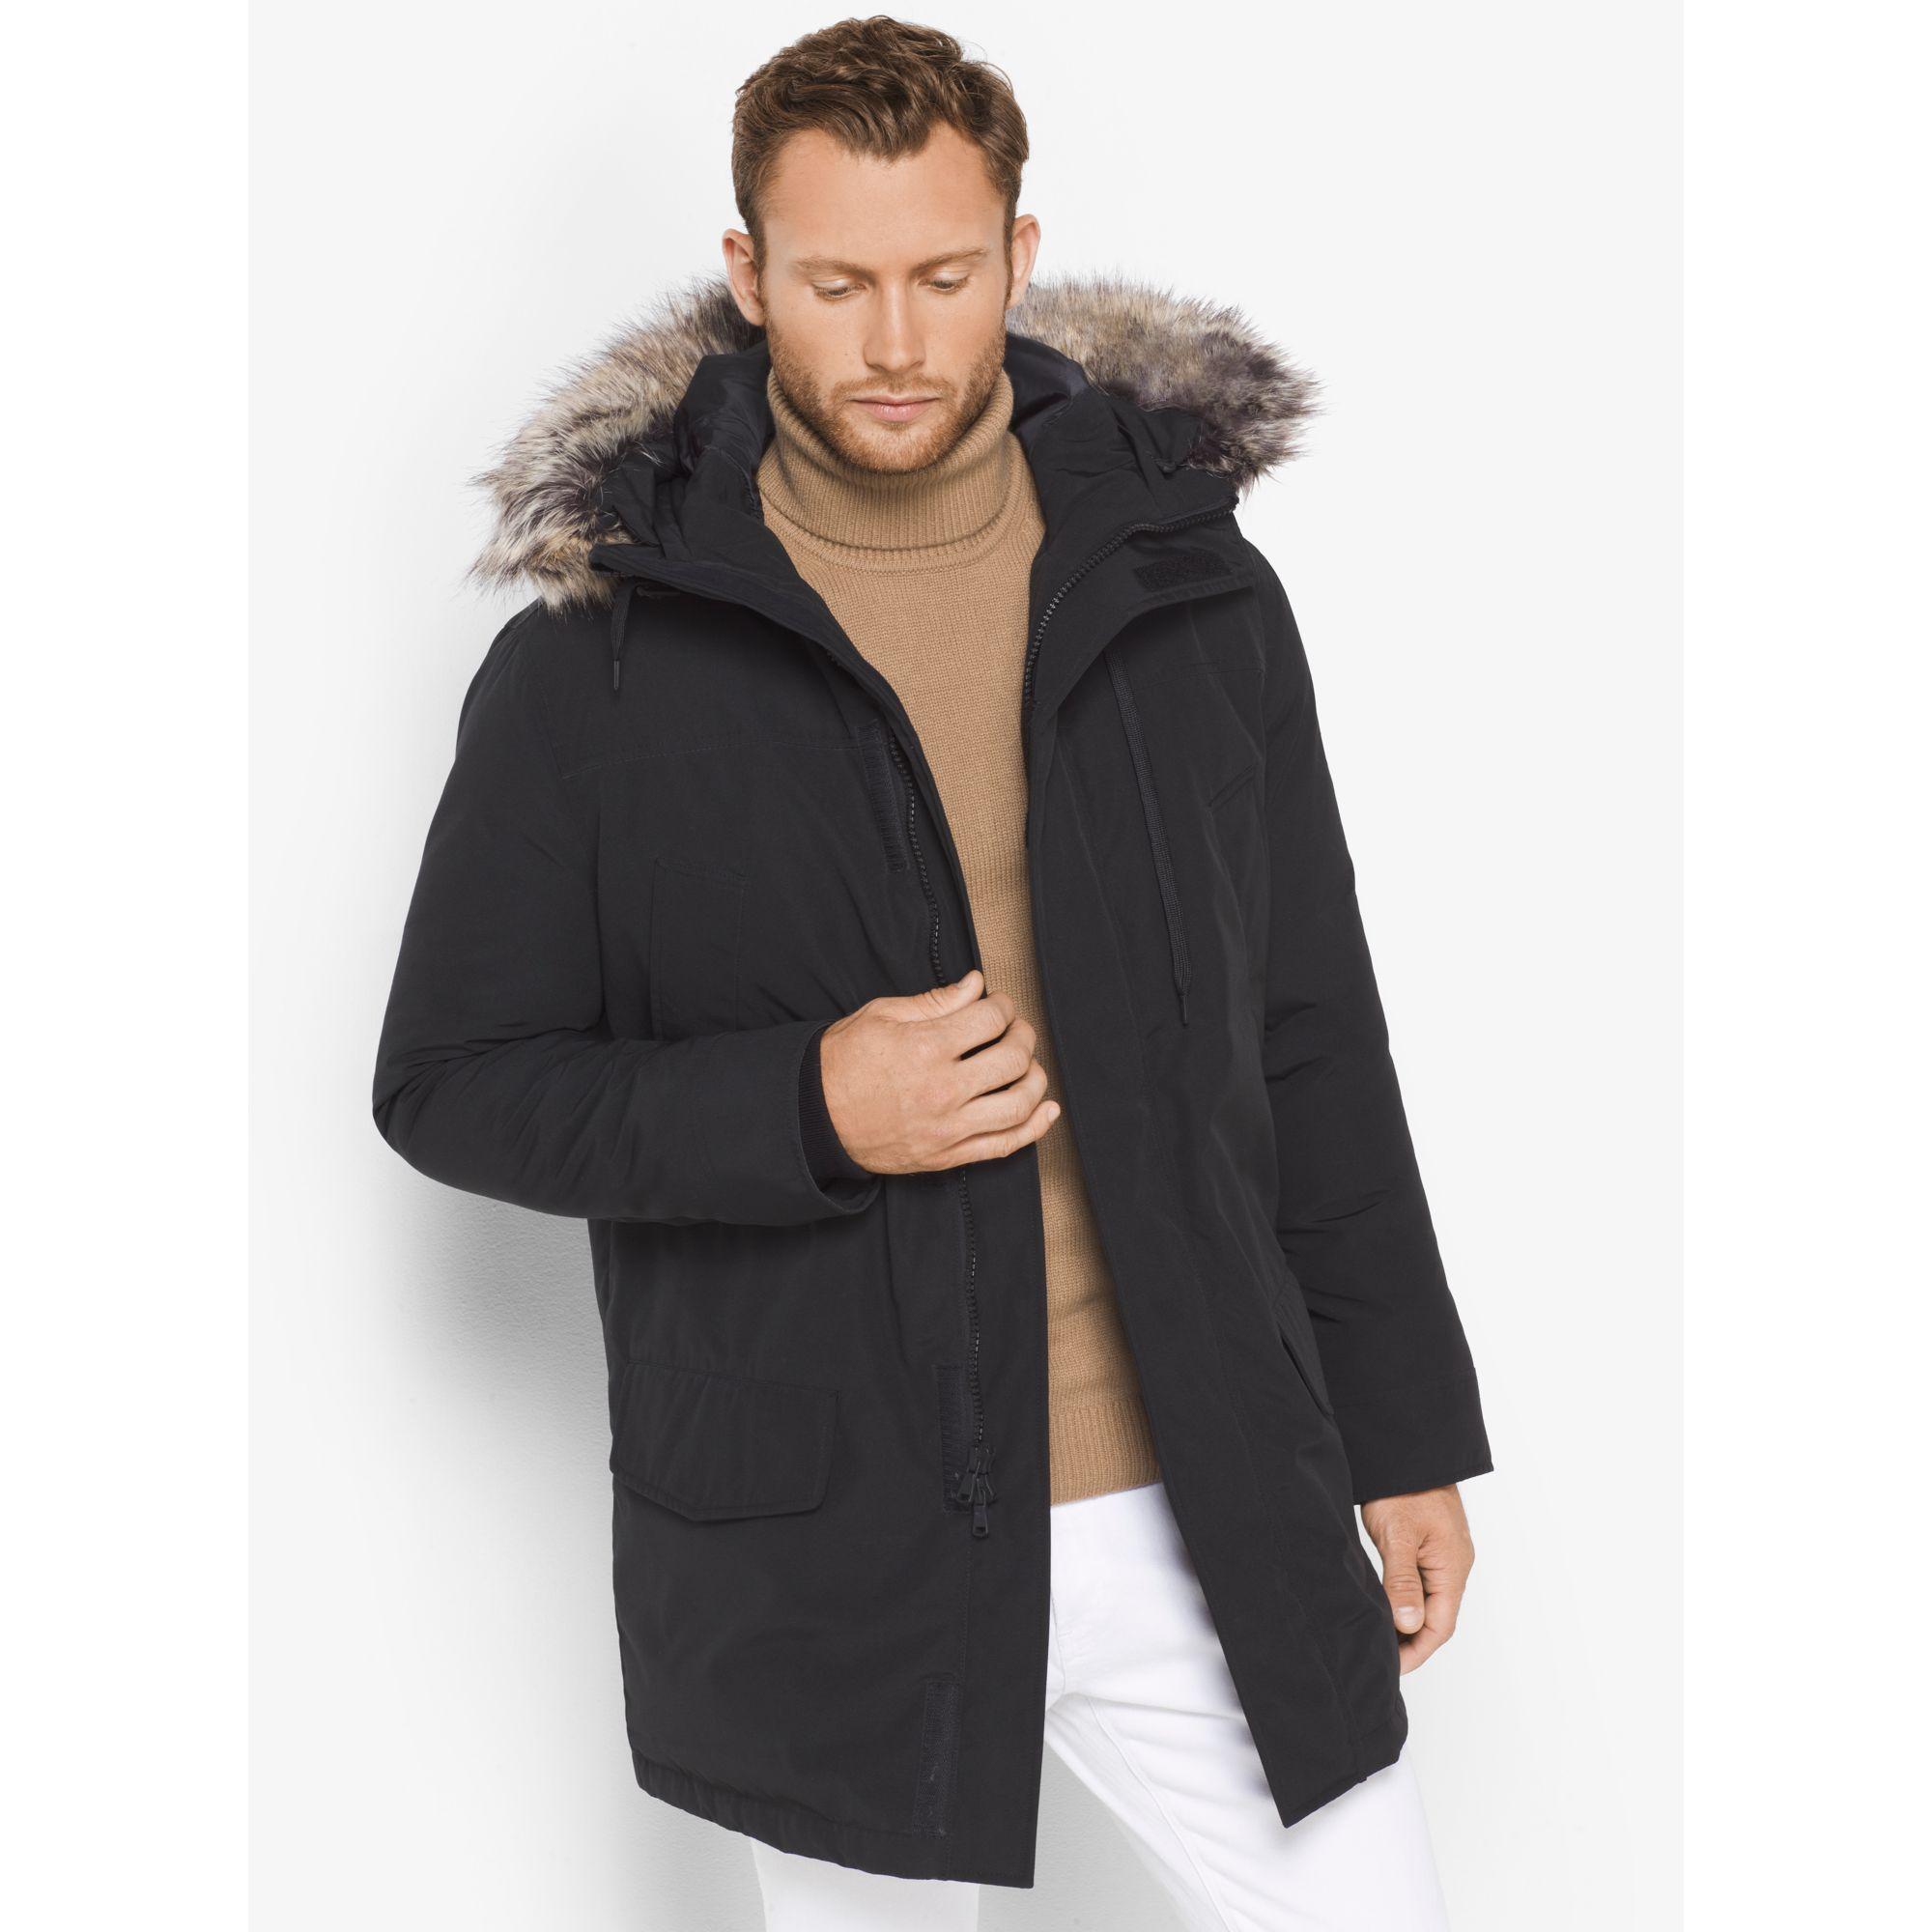 f50f0df4550a Lyst - Michael Kors Faux-fur Trimmed Tech Parka in Black for Men